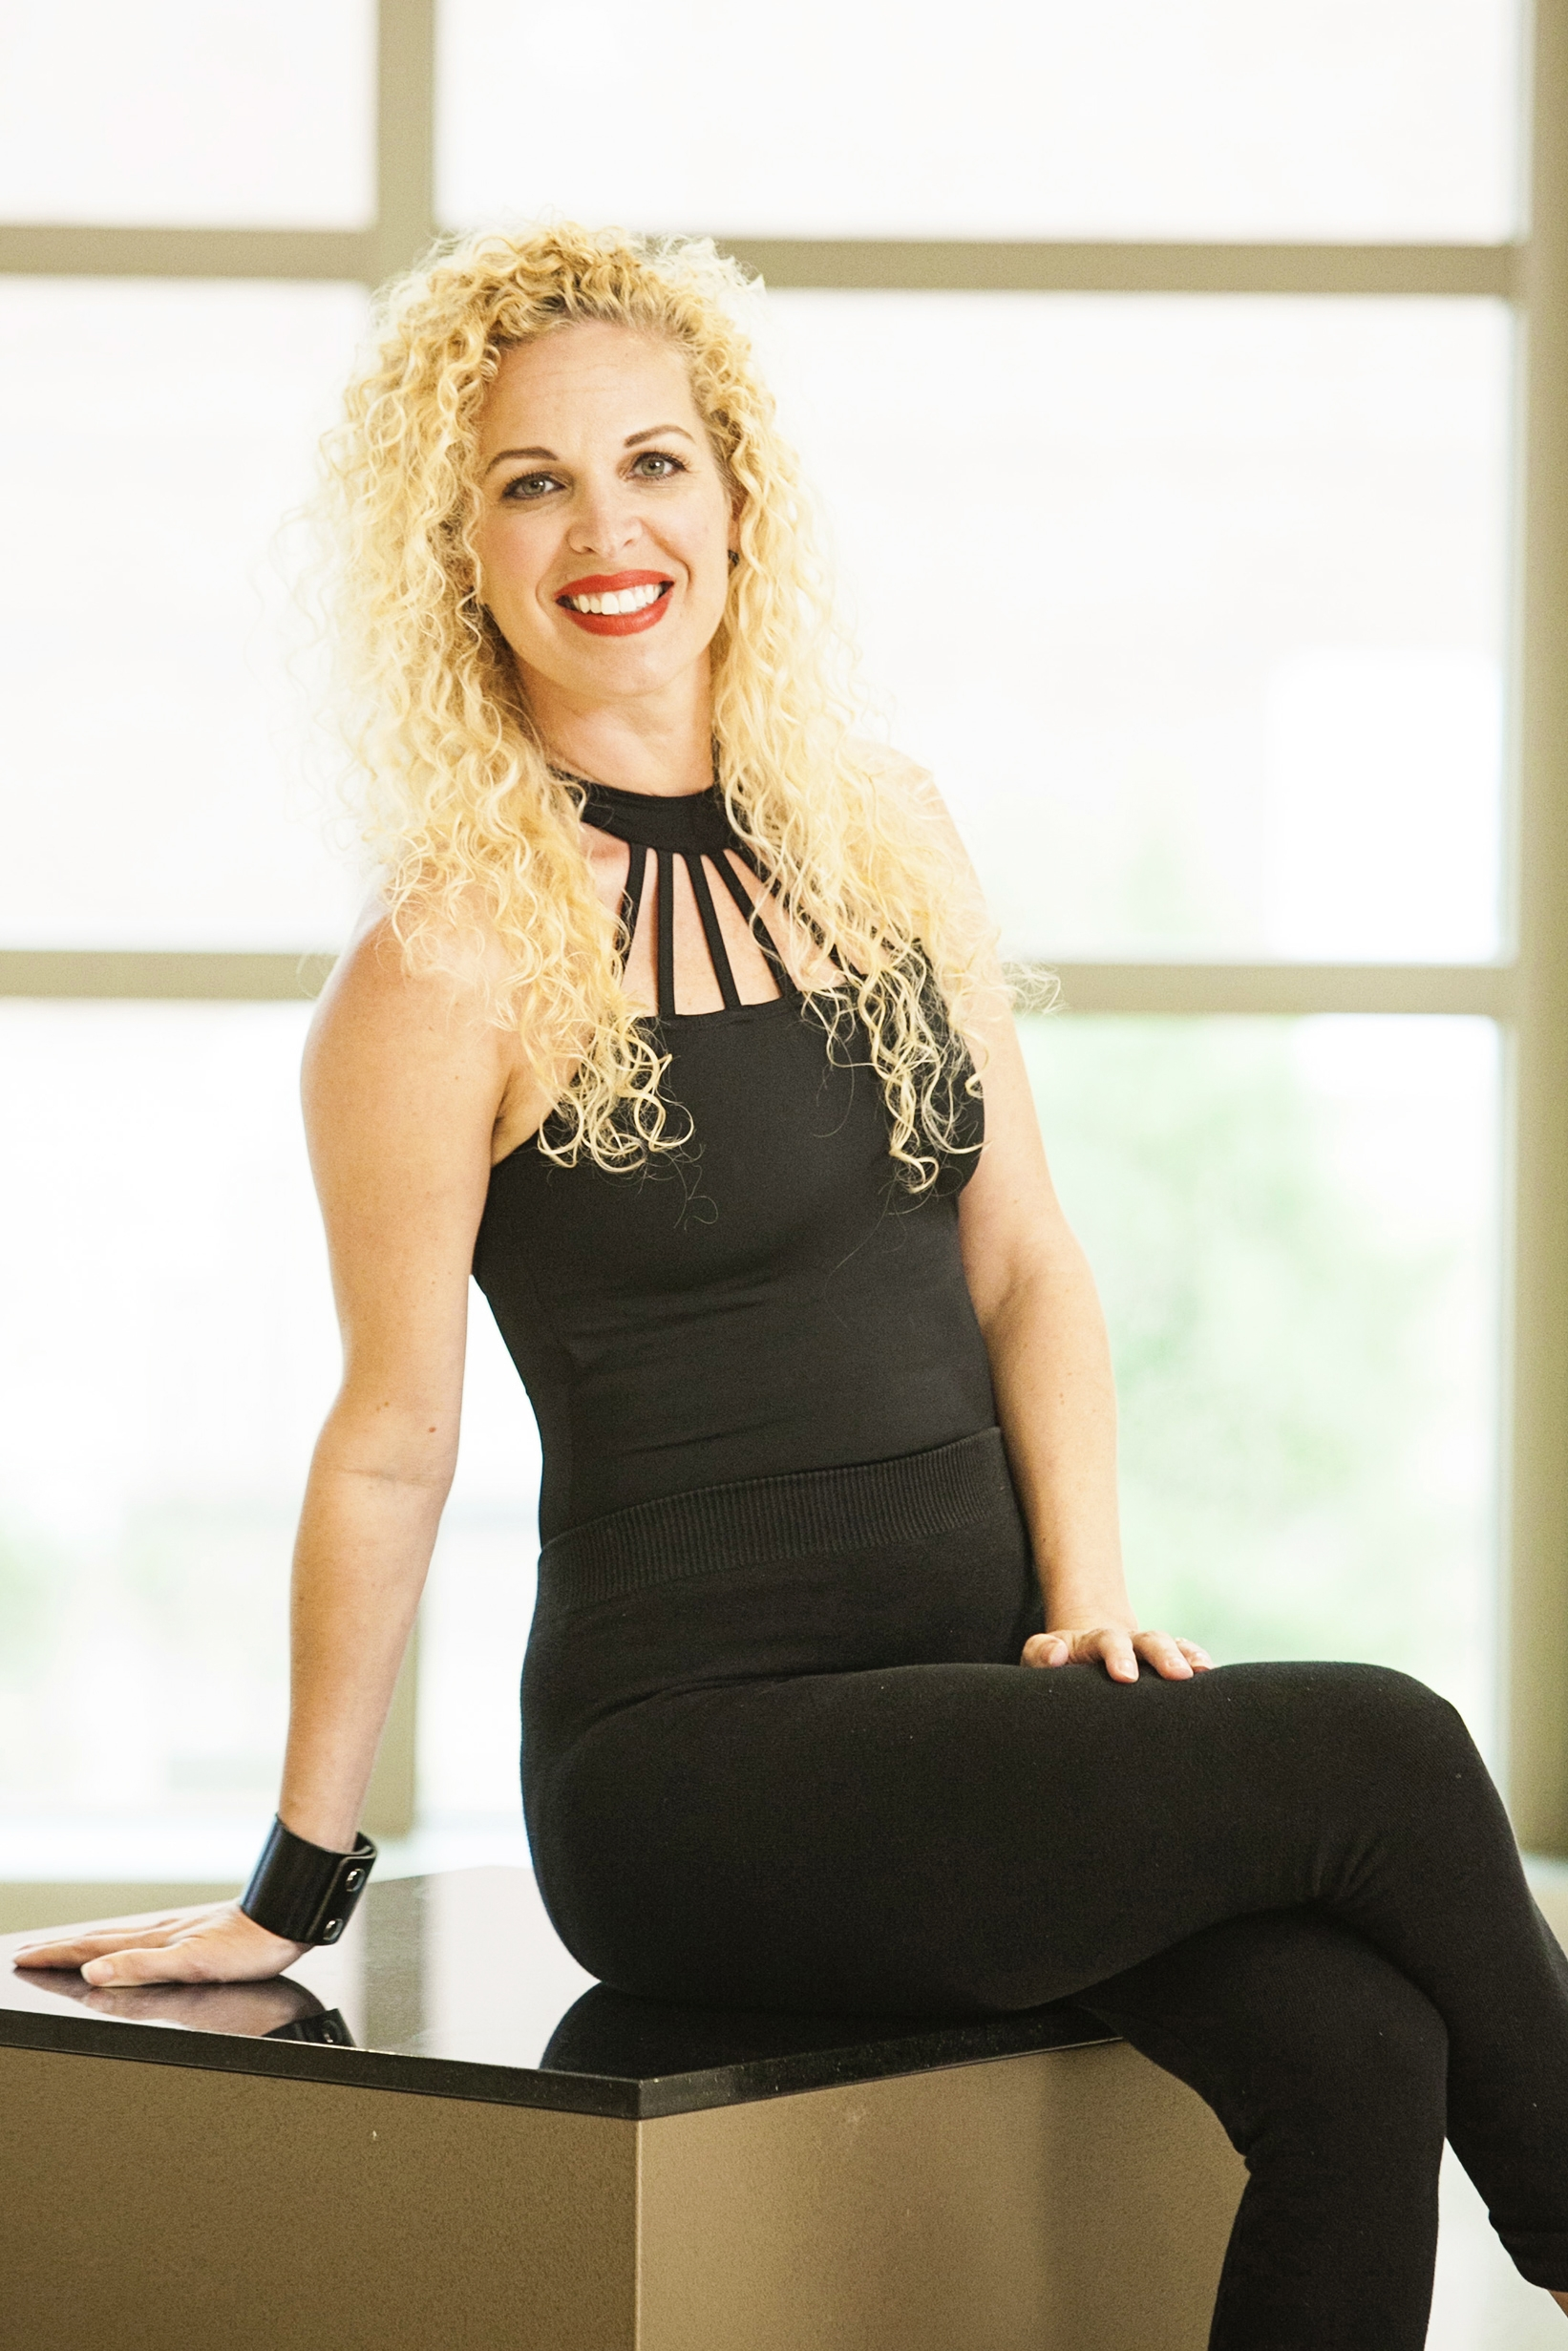 Heather manuka - Competition Team Director